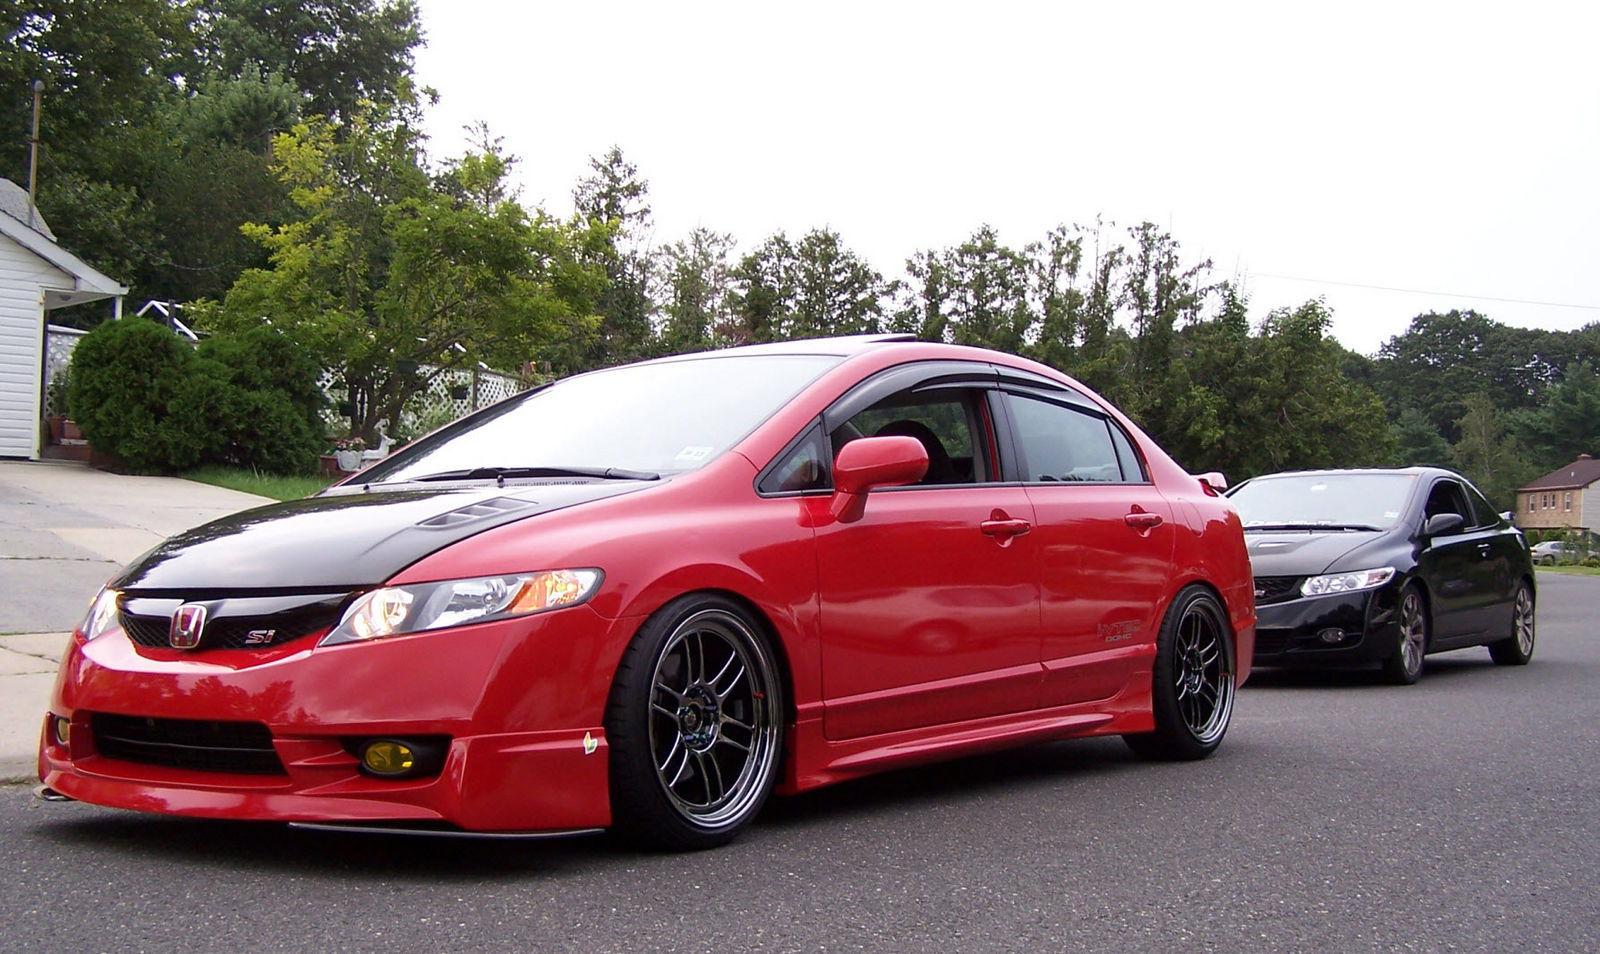 What Wheels For This Car Honda Tech Honda Forum Discussion